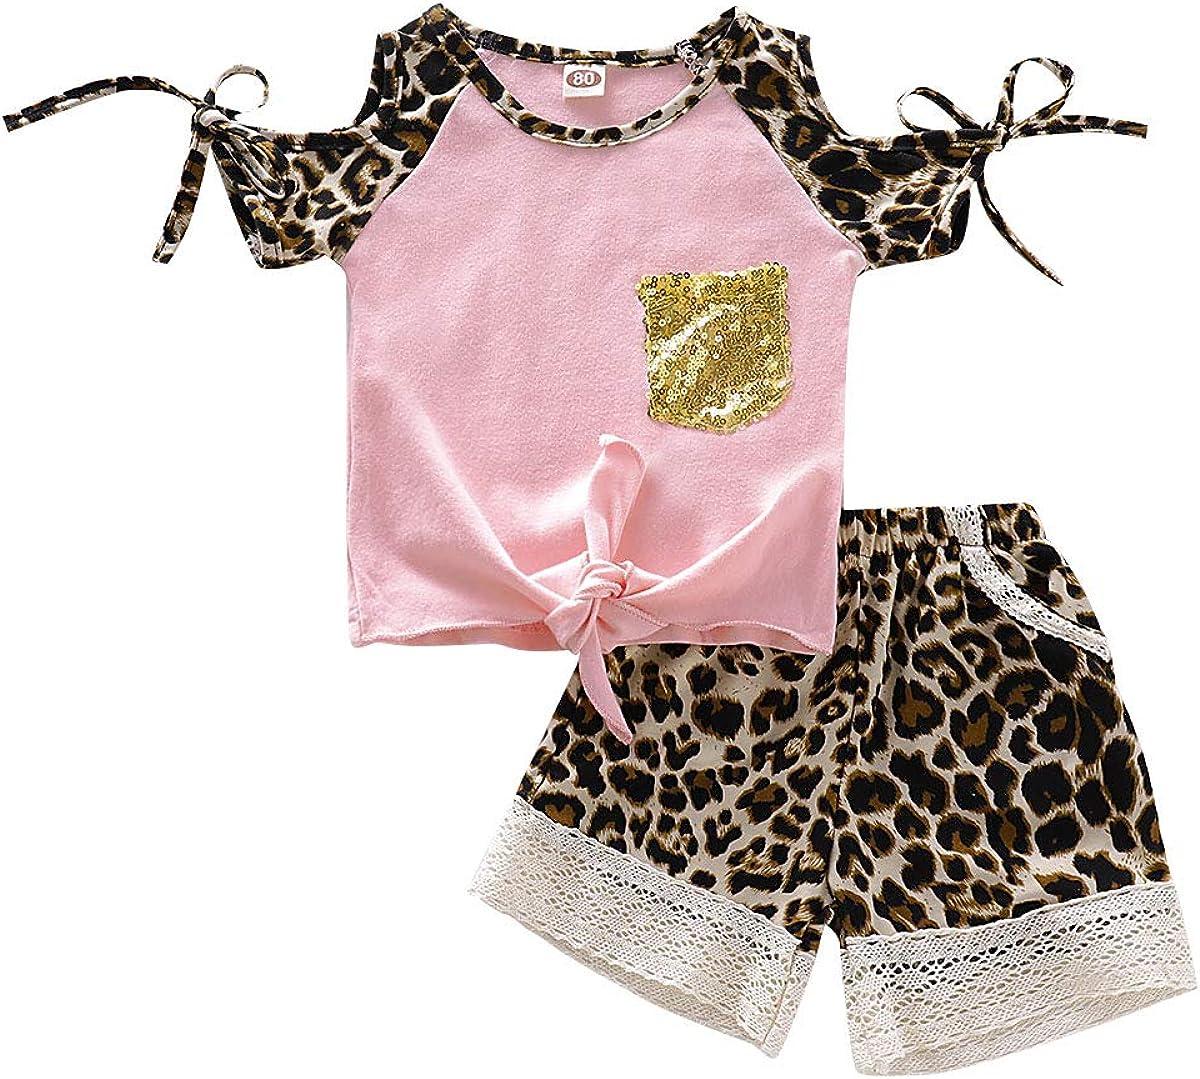 Toddler Baby Girl Outfits Clothes Baseball Sister Print Short Sleeve T-Shirt Tops Tassel Floral Short Pant Set